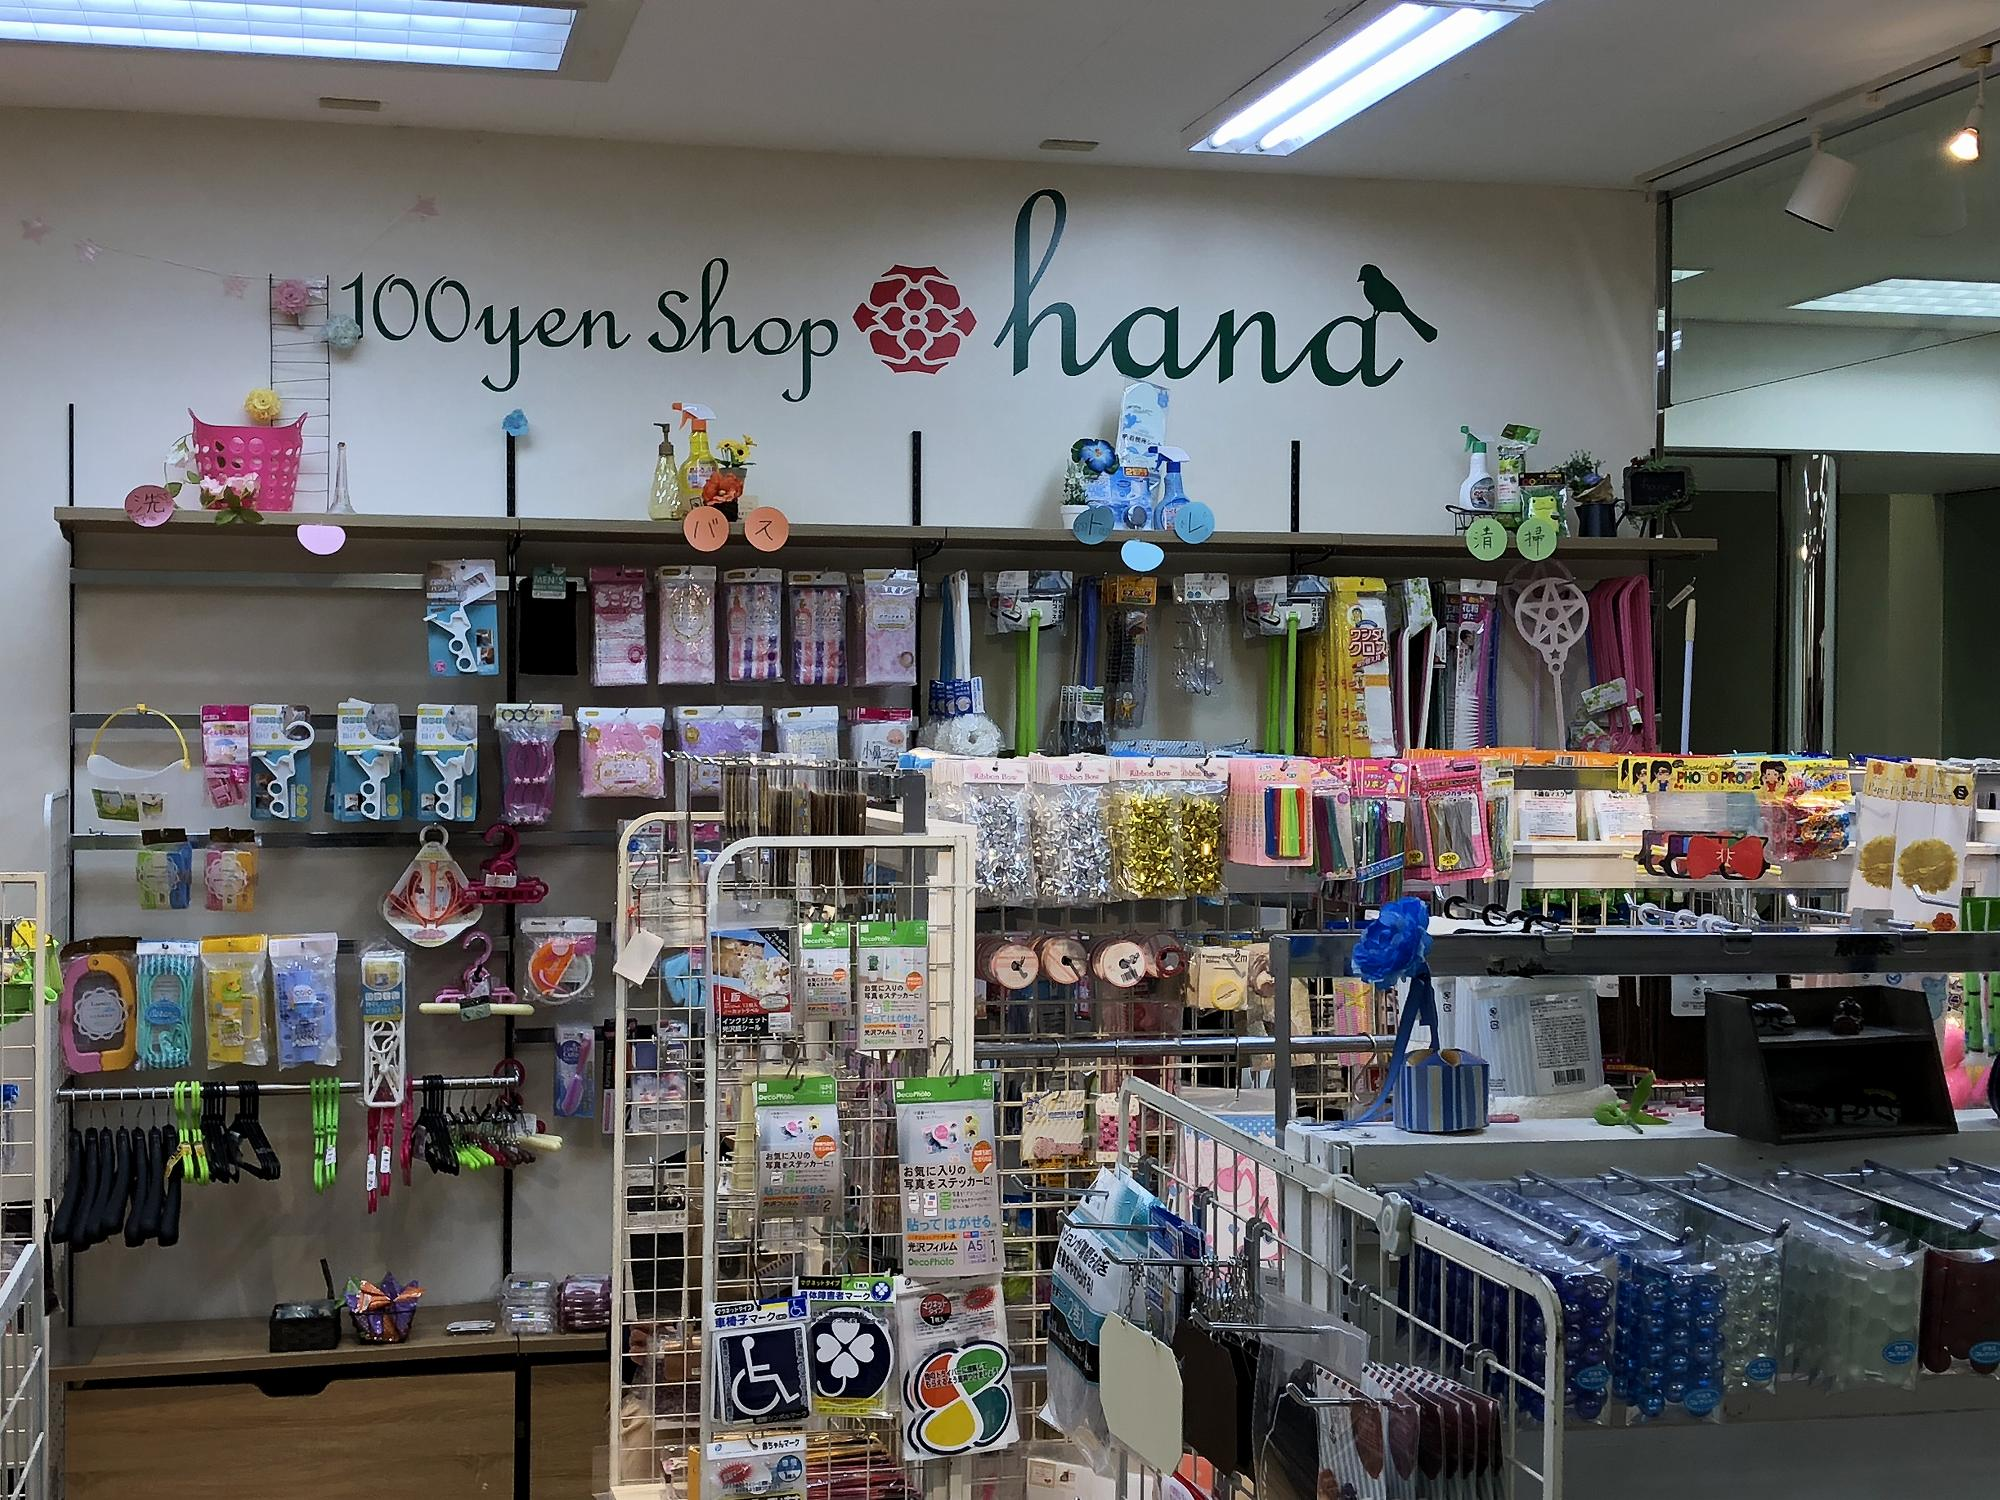 JR住吉駅直結・Liv住吉4階の「100yen shop hana 神戸住吉店」が1/24(水)で閉店するよ #閉店情報 #Liv住吉